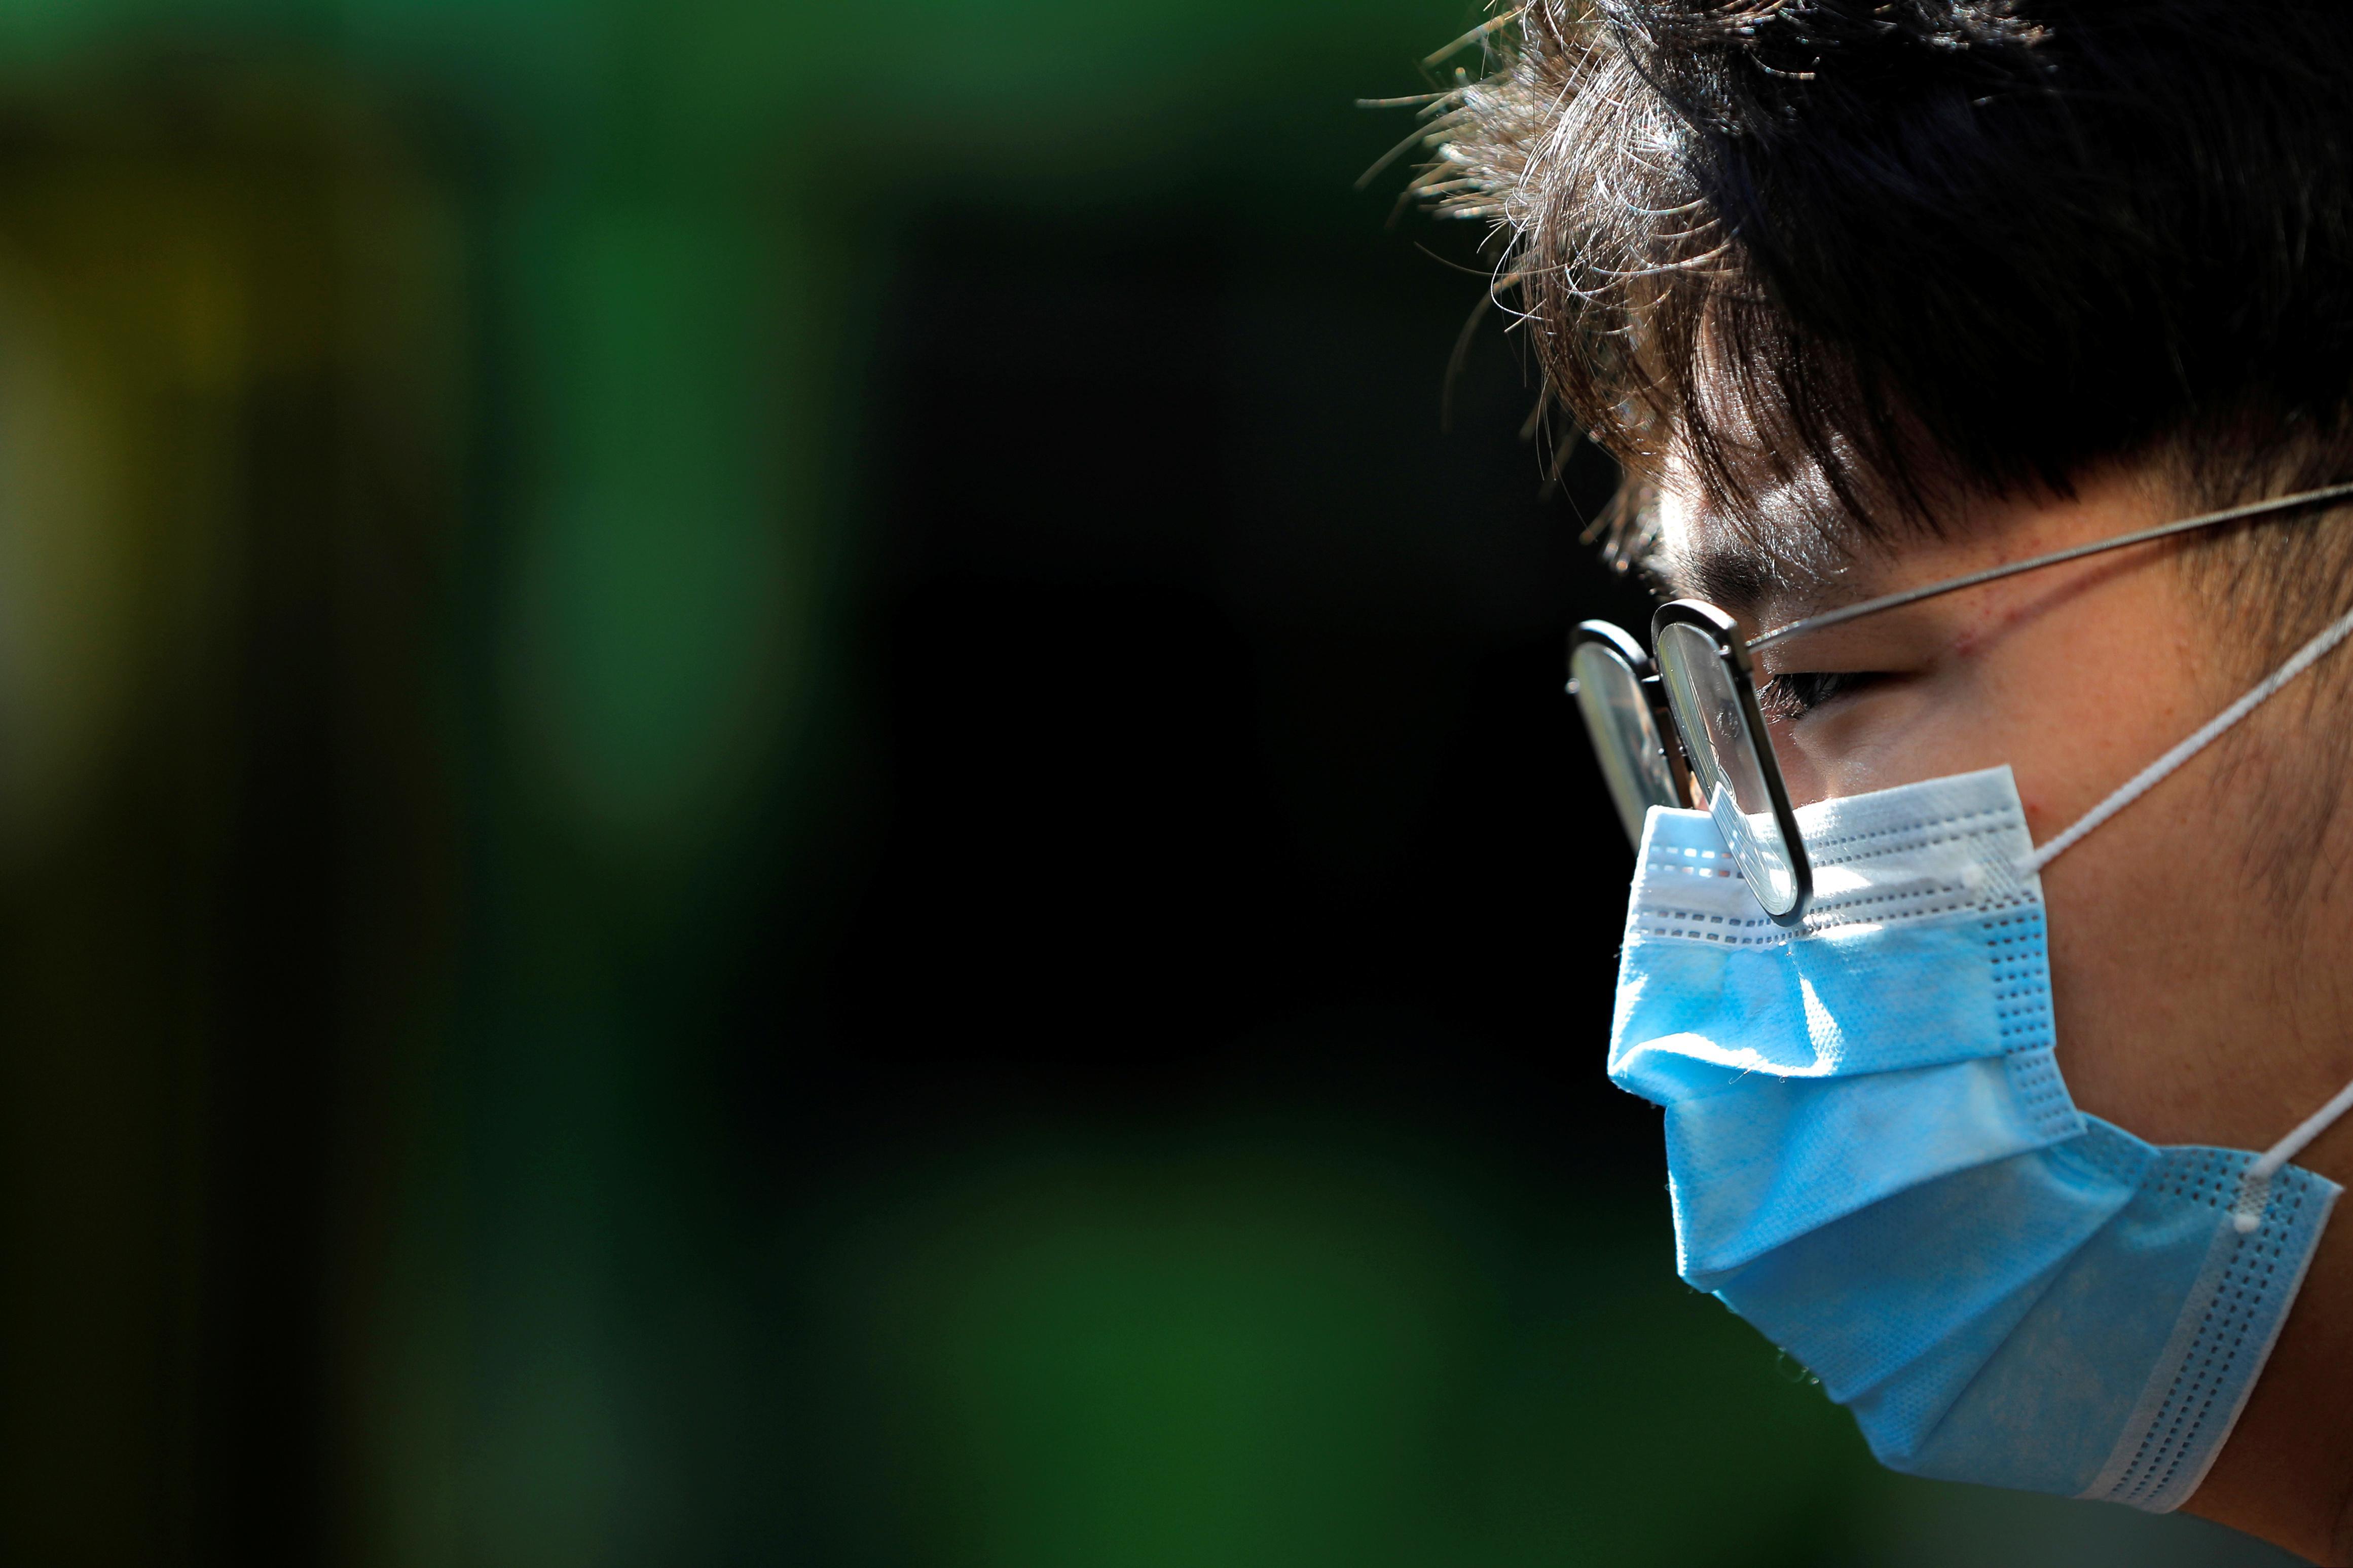 two new uk coronavirus cases linked to italy tenerife